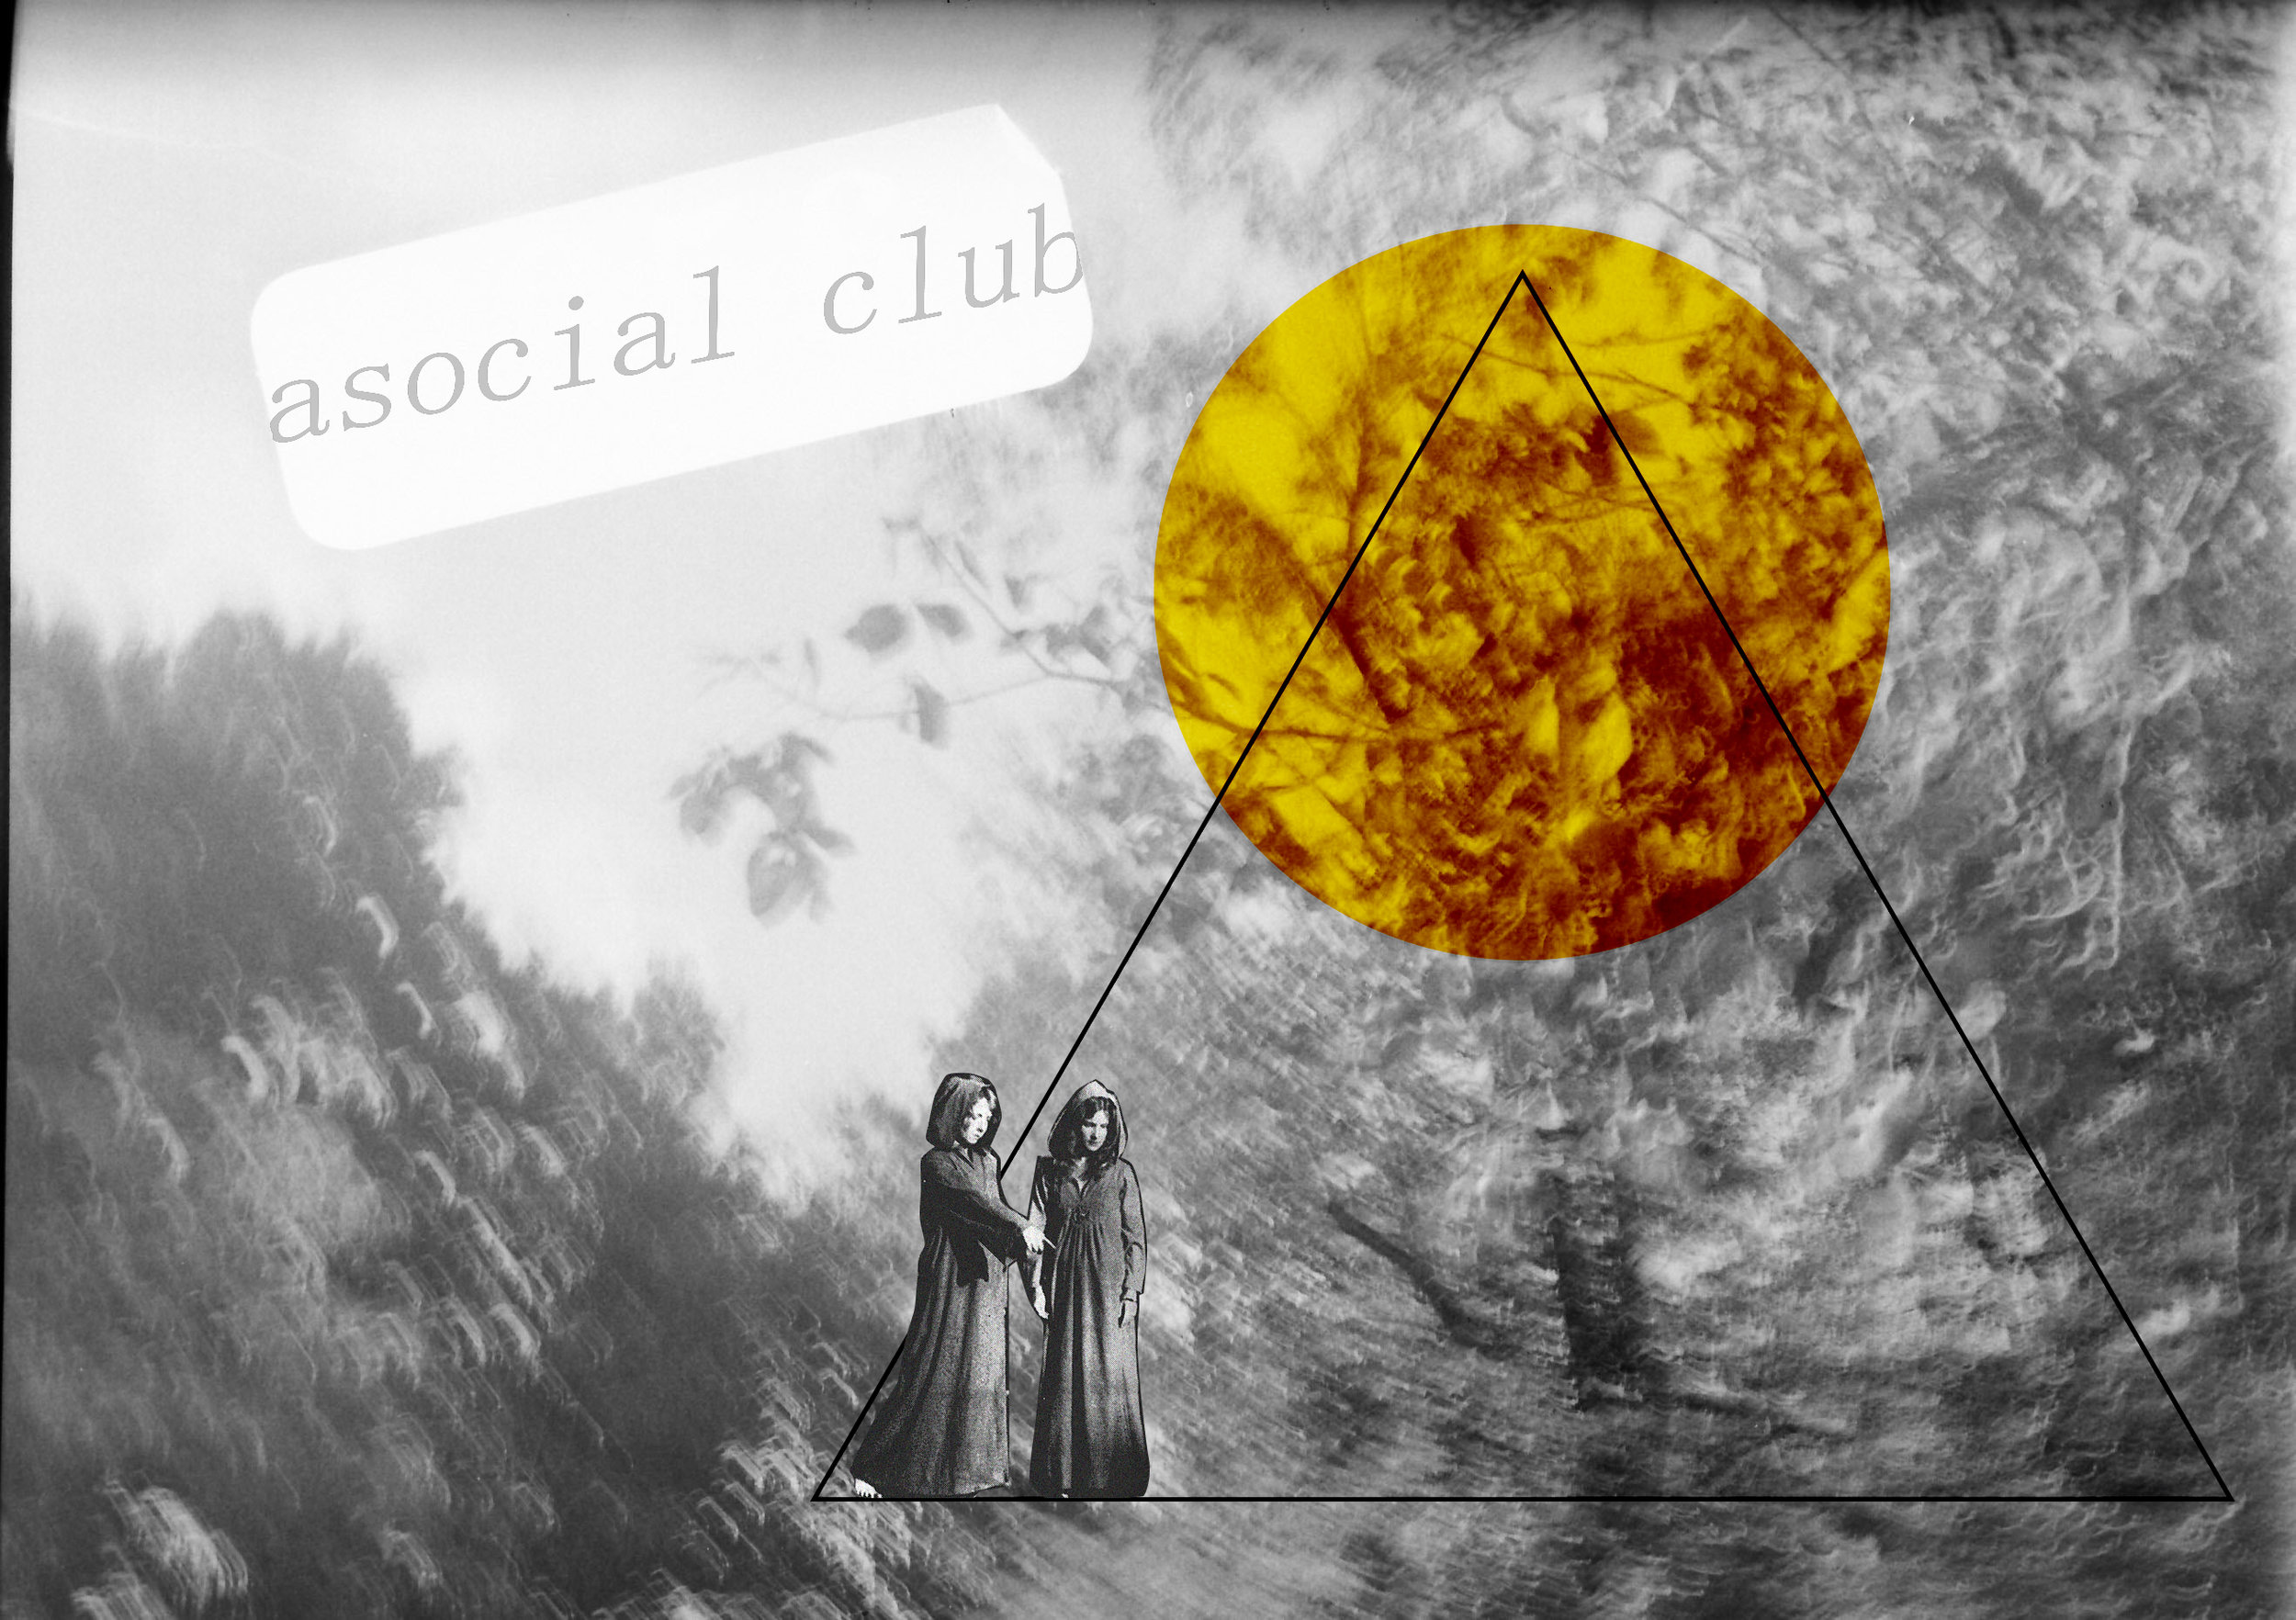 asocial club.jpg